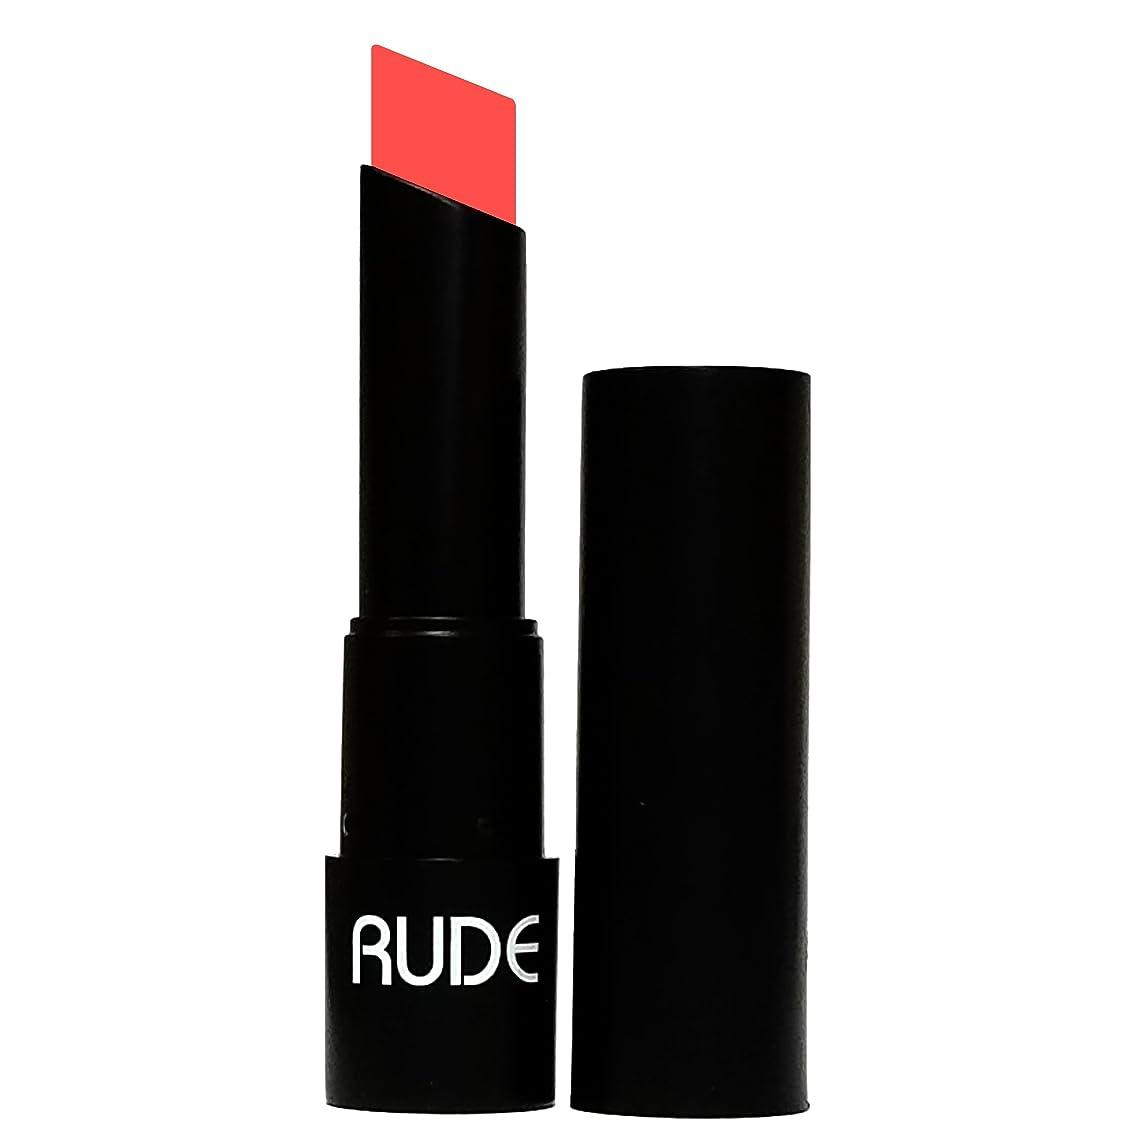 憂鬱夜間夜RUDE Attitude Matte Lipstick - Pompous (並行輸入品)